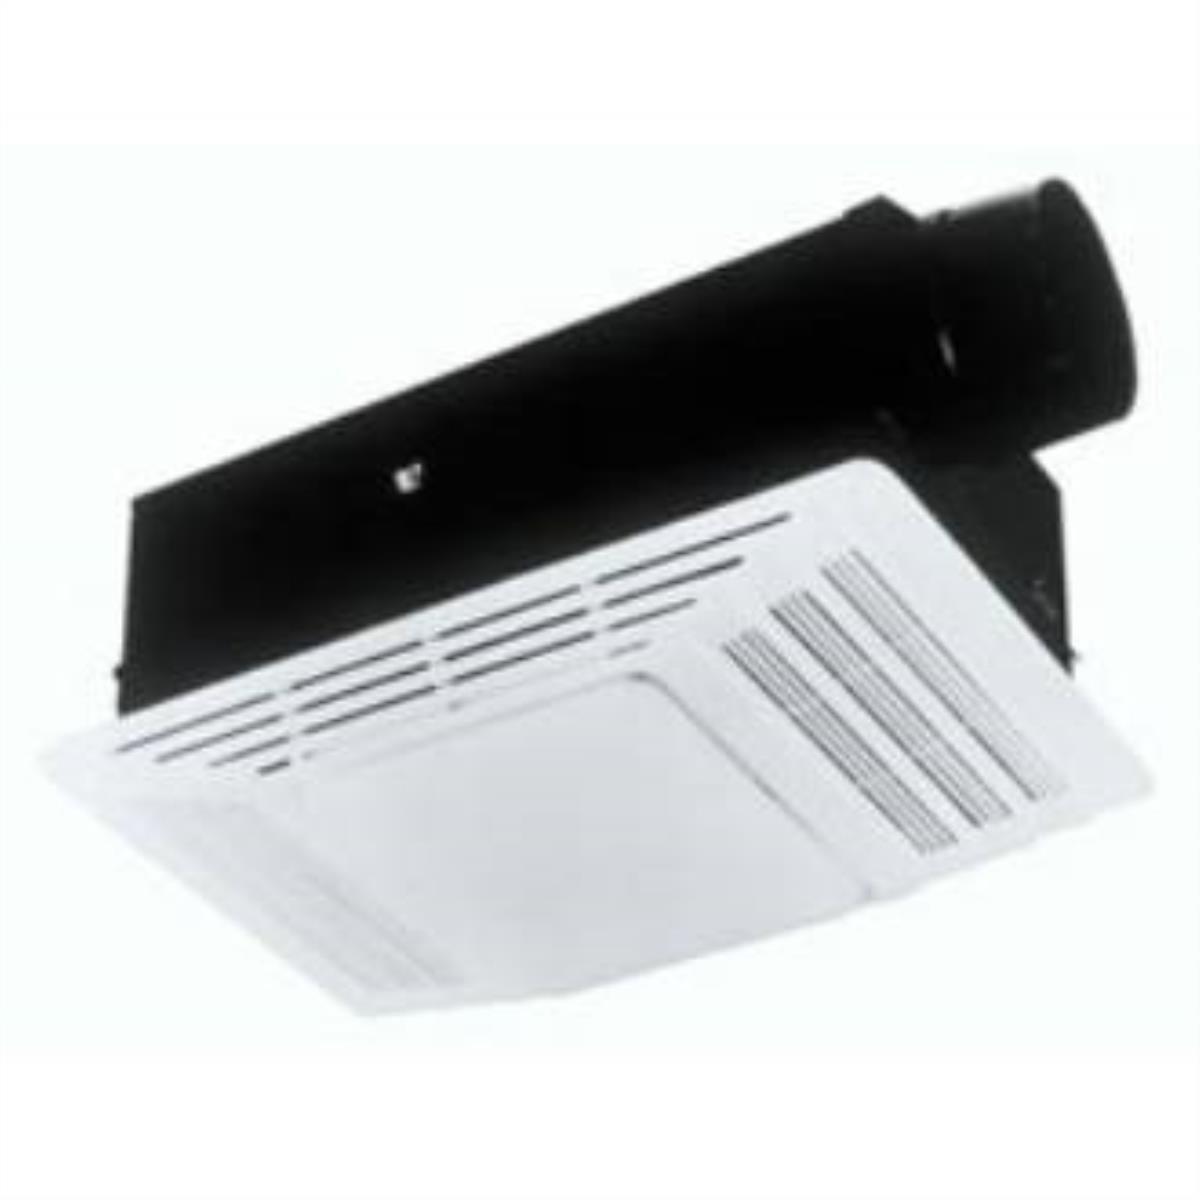 New Broan 655 Heater and Heater Bath Fan with Light Combination  eBay